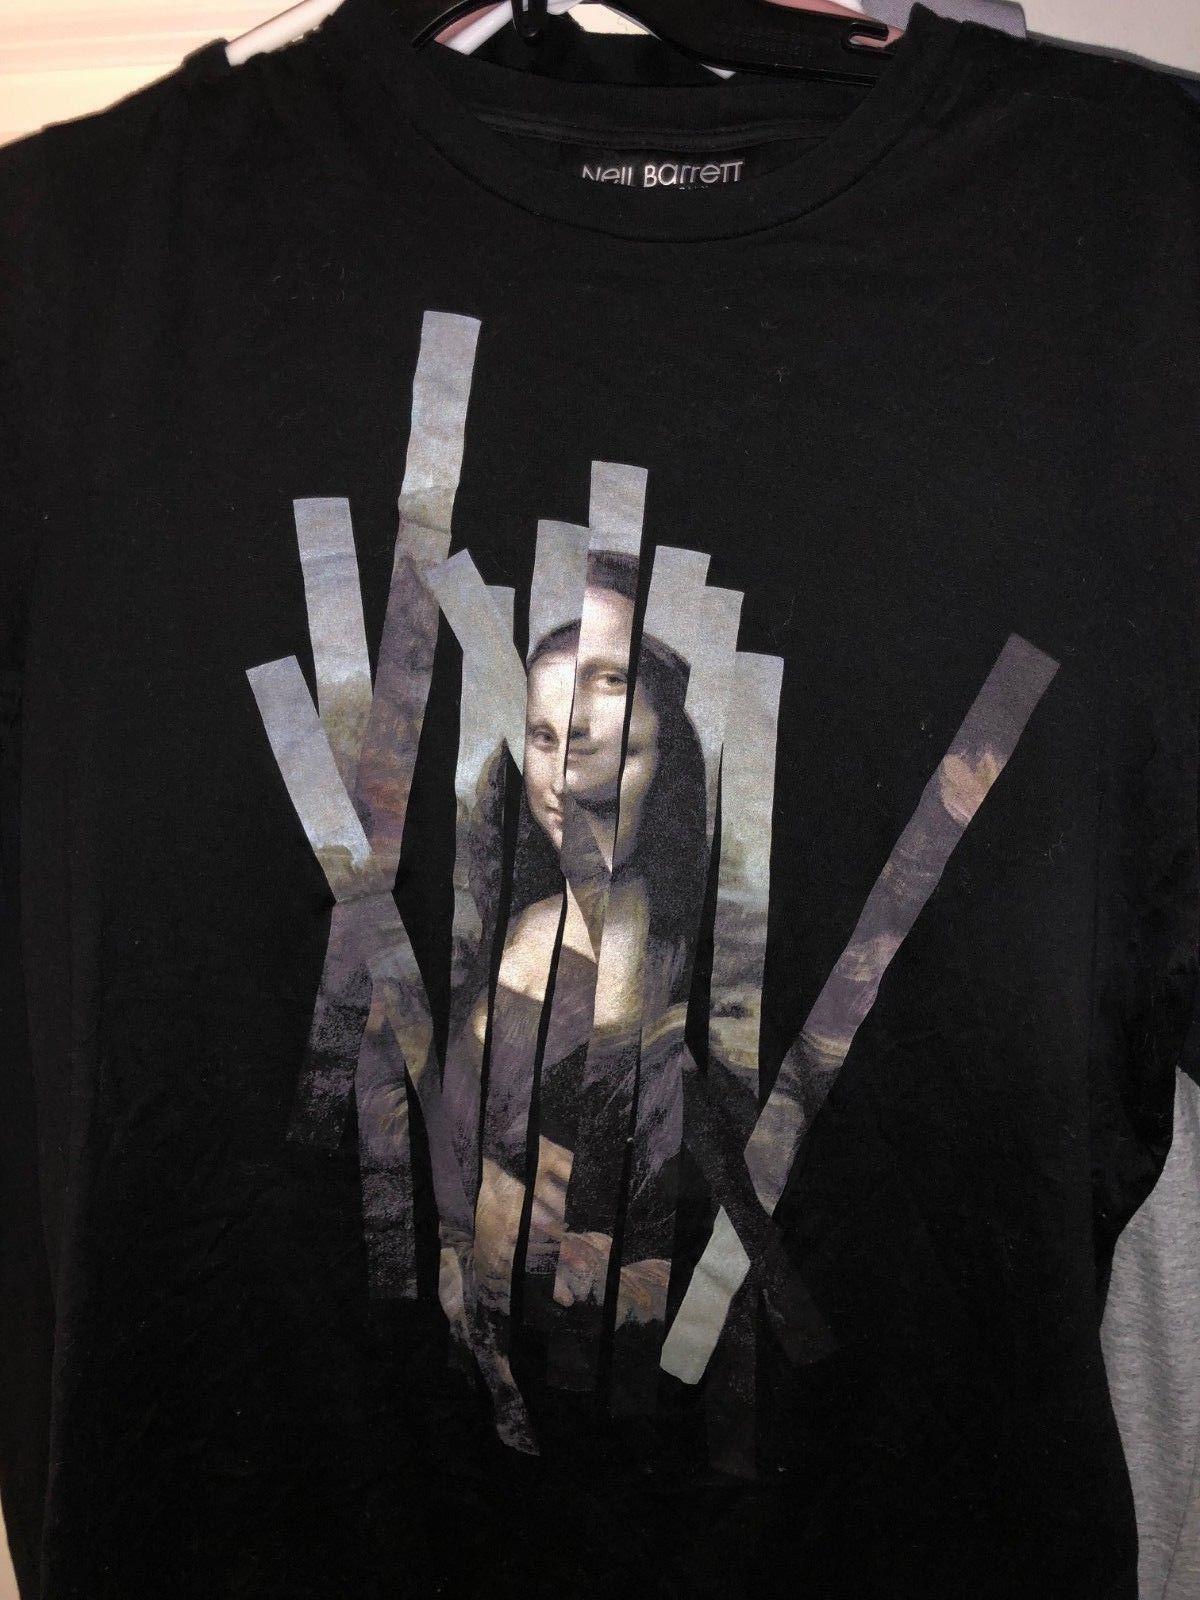 92e2664a139e2 Compre Neil Barrett Camiseta Mona Lisa Pequeña Negra Camisetas De Marca  Jeans Imprimir Miedo Cosplay Liverpoott Camiseta A  16.24 Del Adidascup